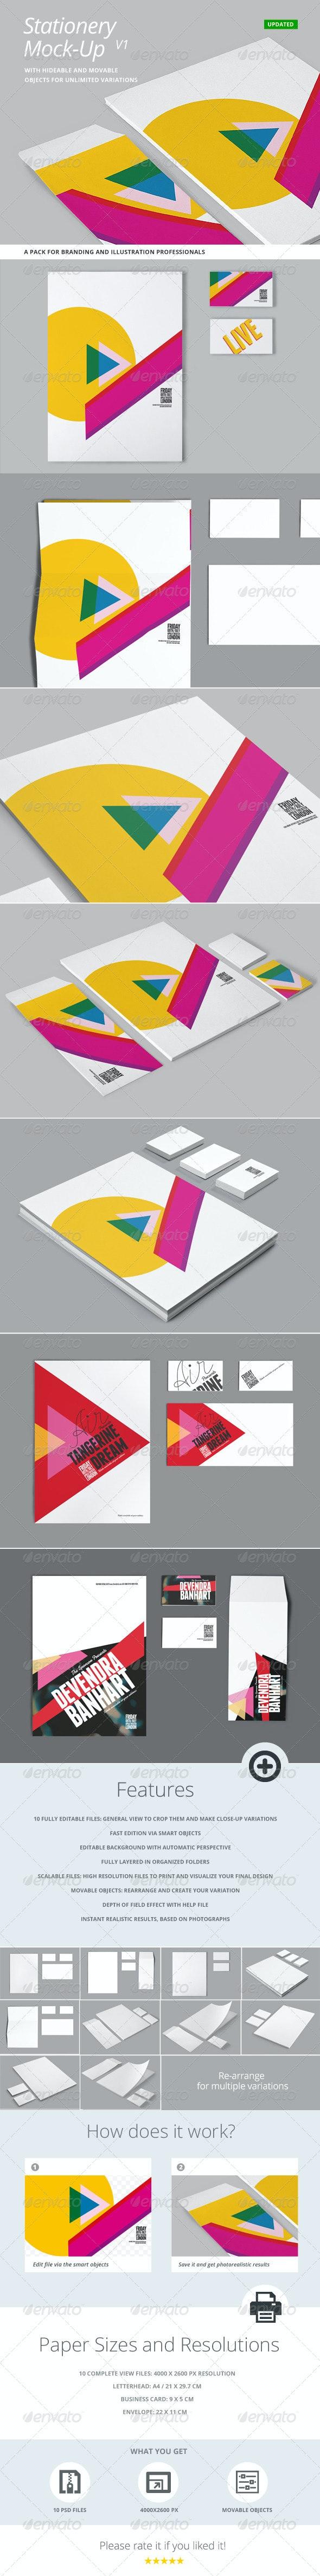 Stationery and Branding Mock Up - Stationery Print